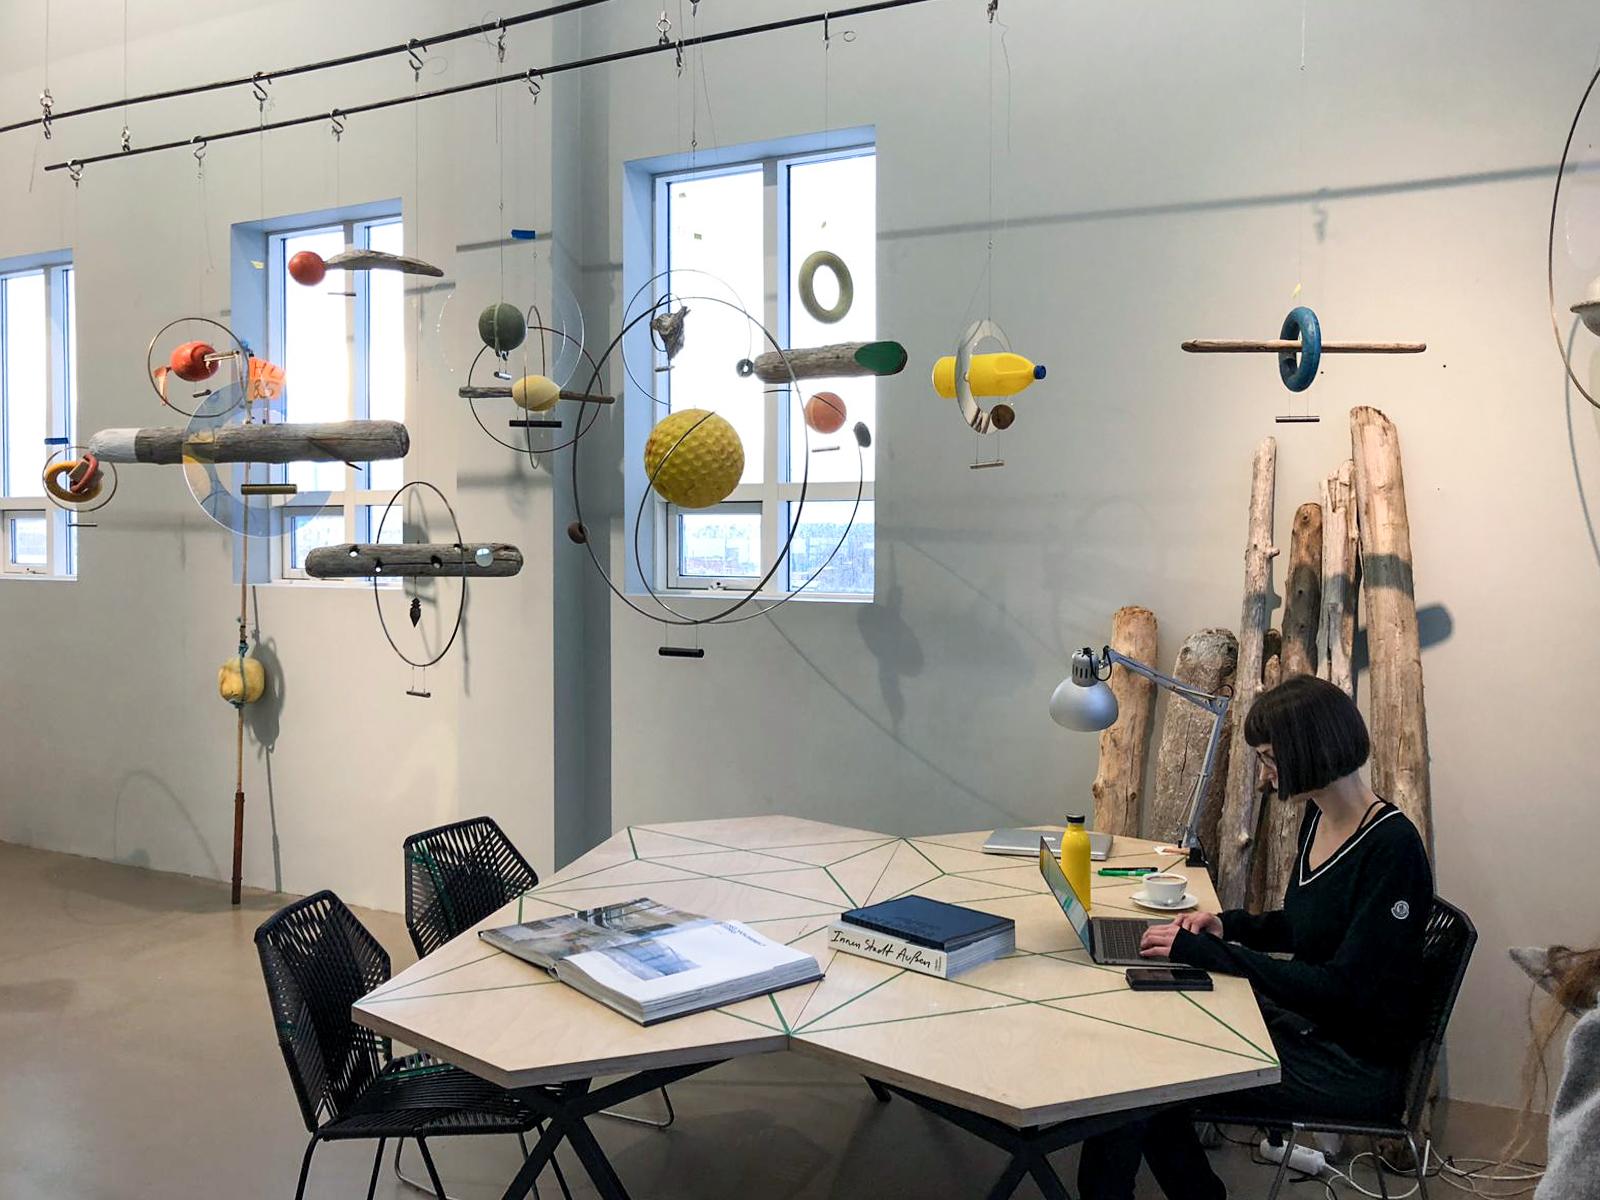 The Marshall House - Studio Ólafur Elíasson